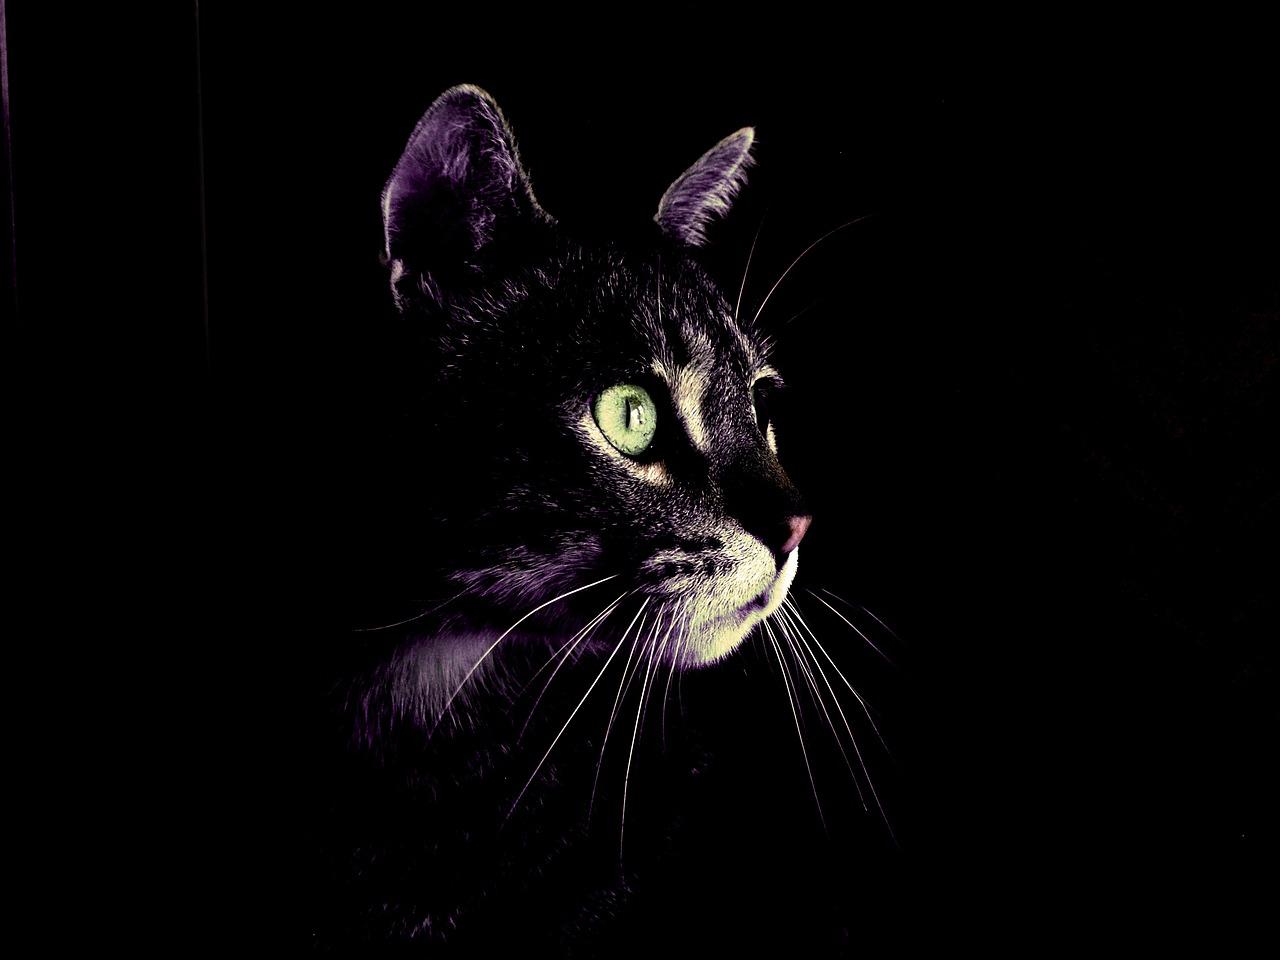 Кошка в темноте картинка